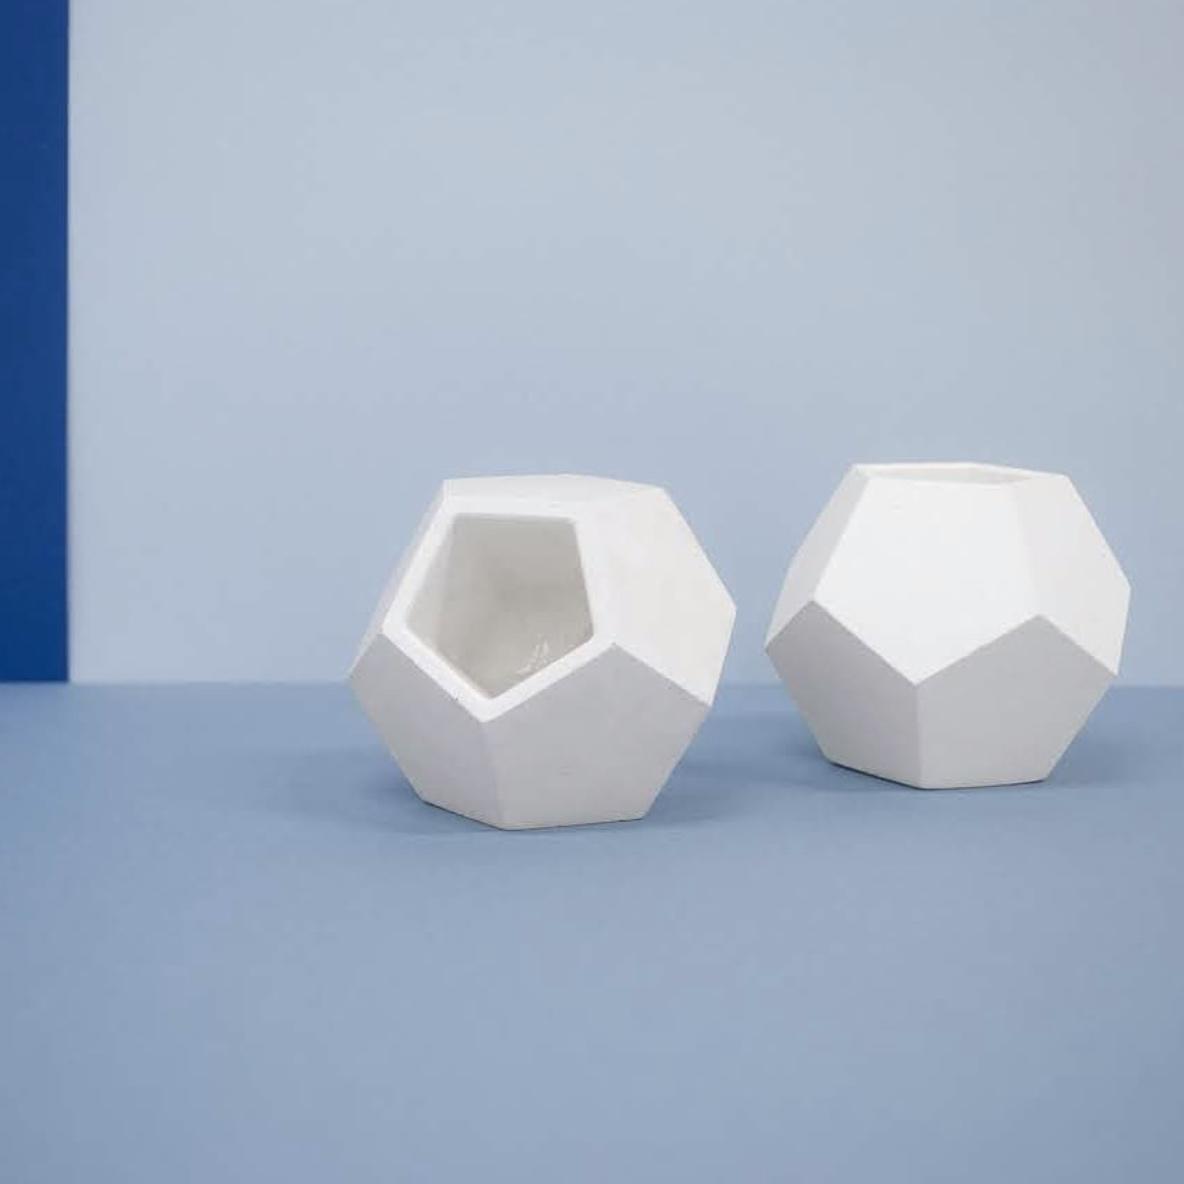 Tykk Design -